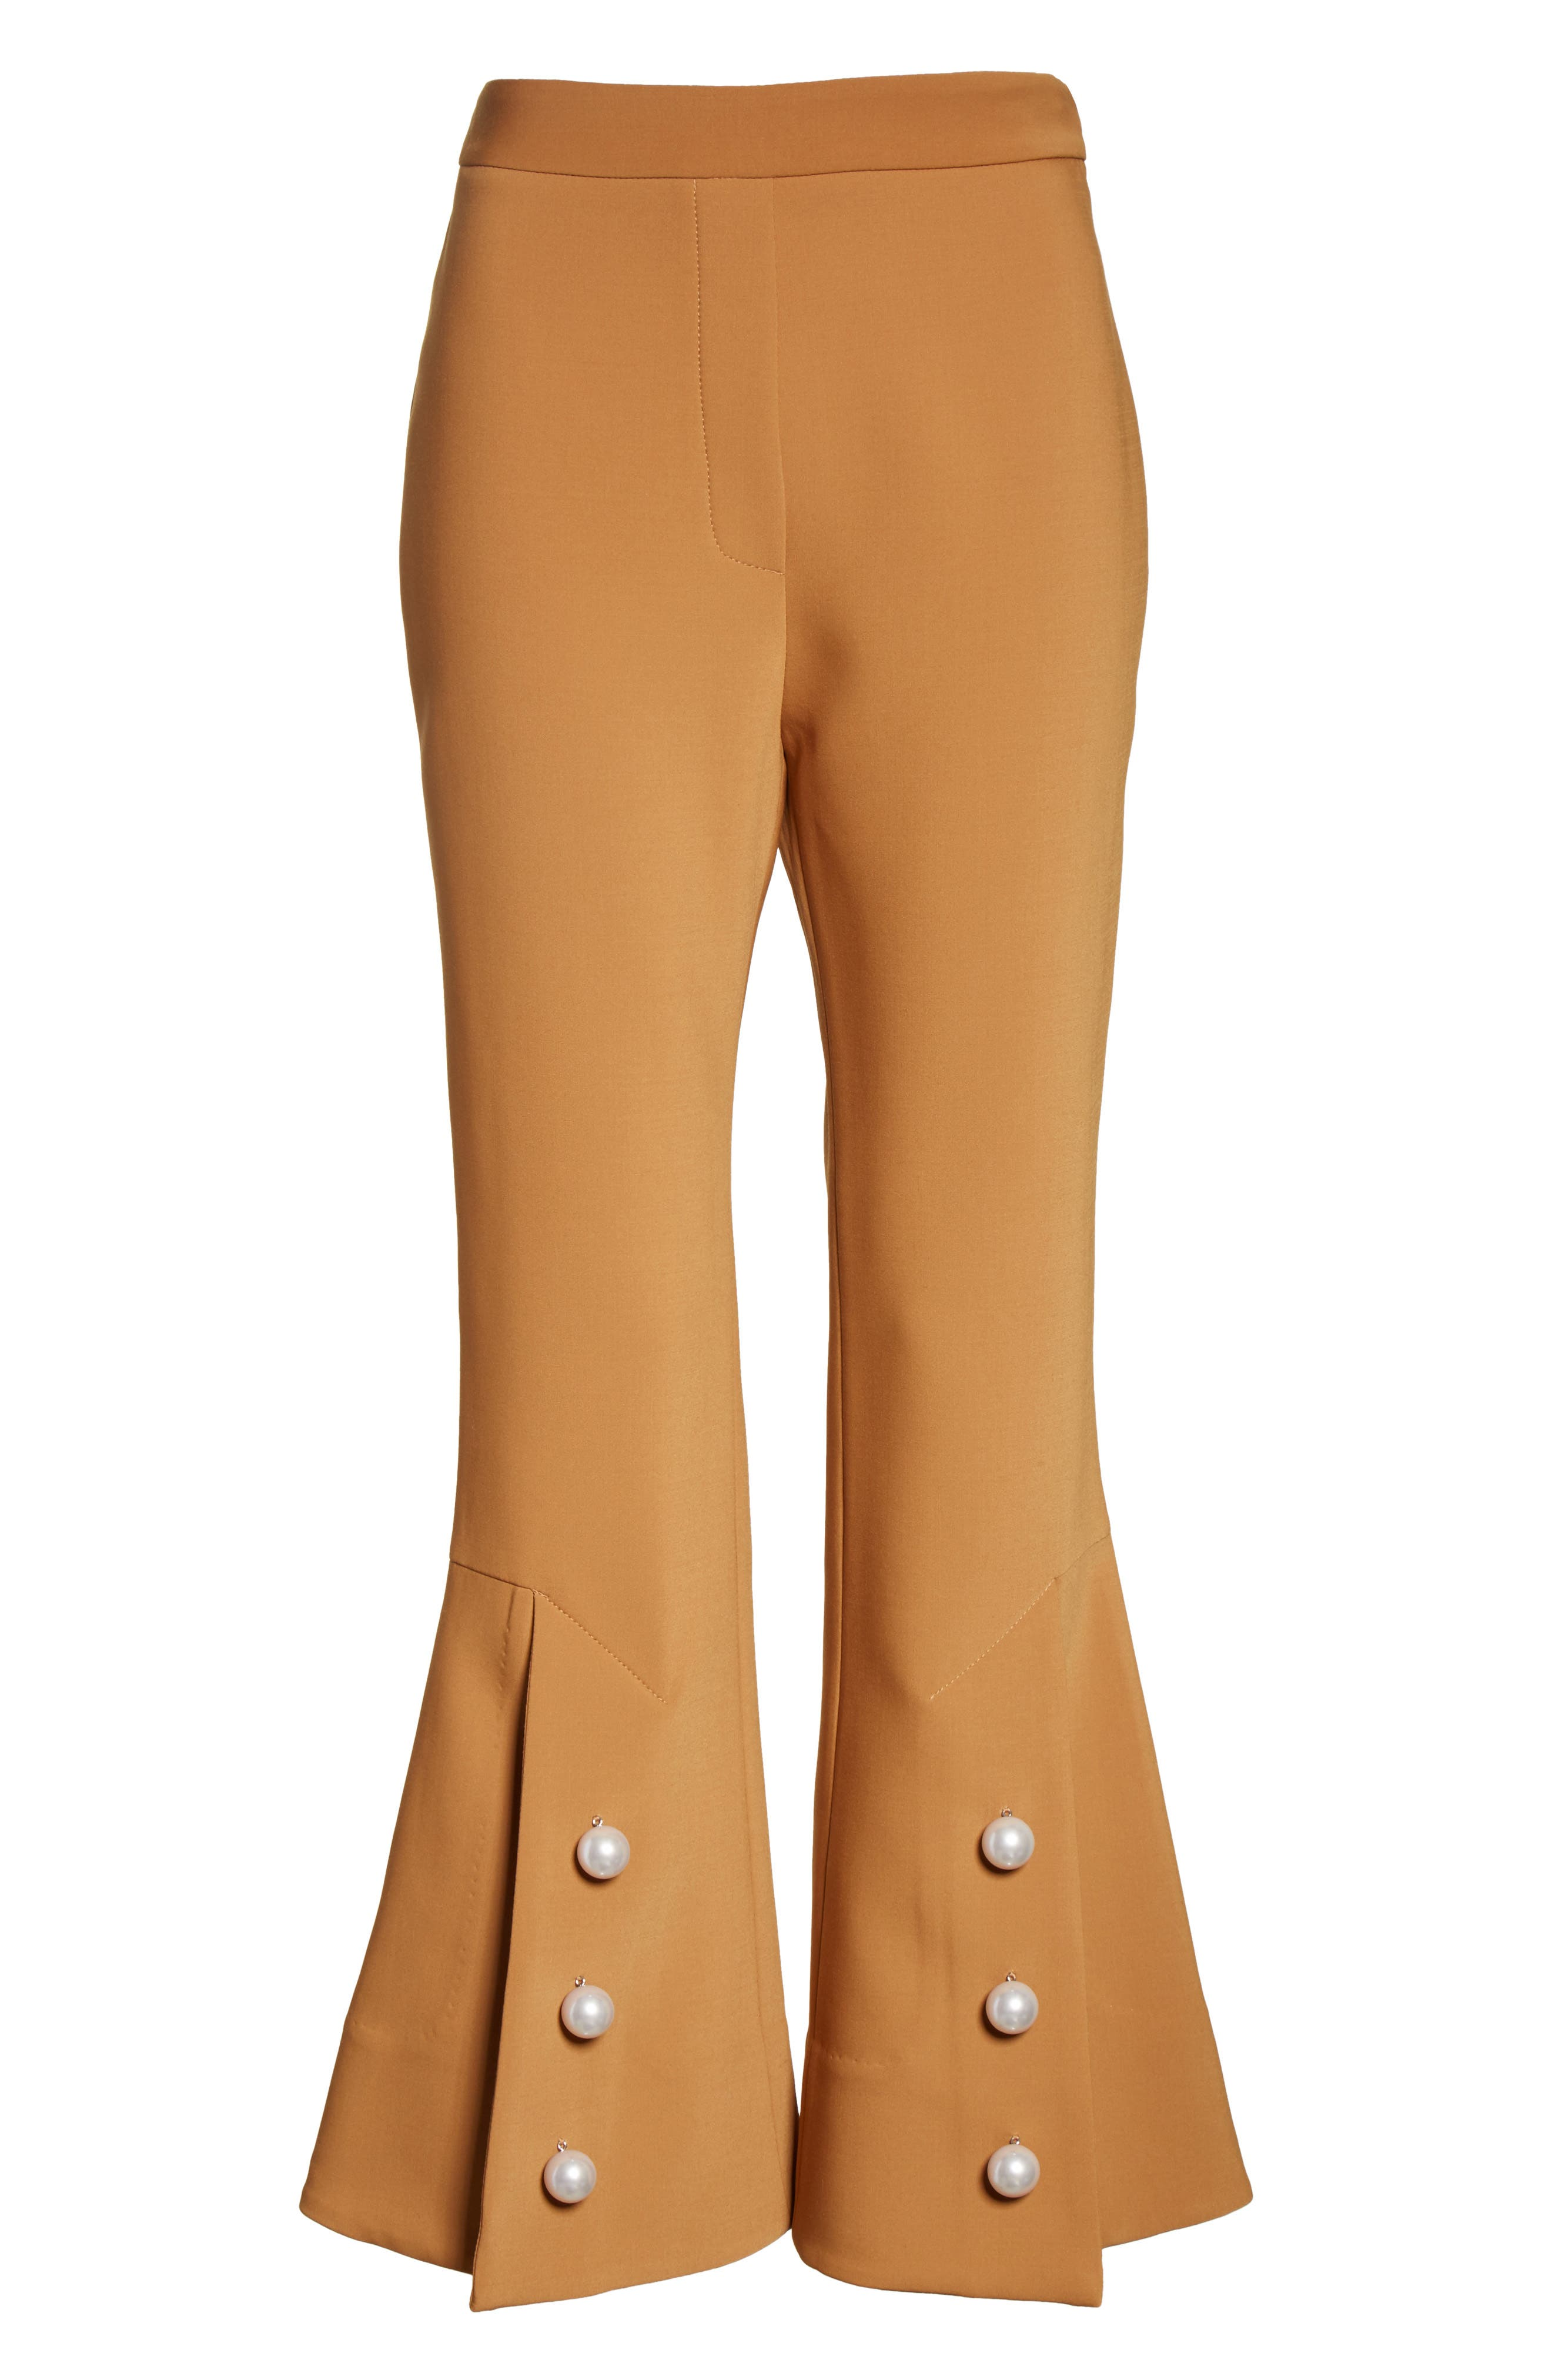 Fourth Element Crop Flare Pants,                             Alternate thumbnail 6, color,                             Camel